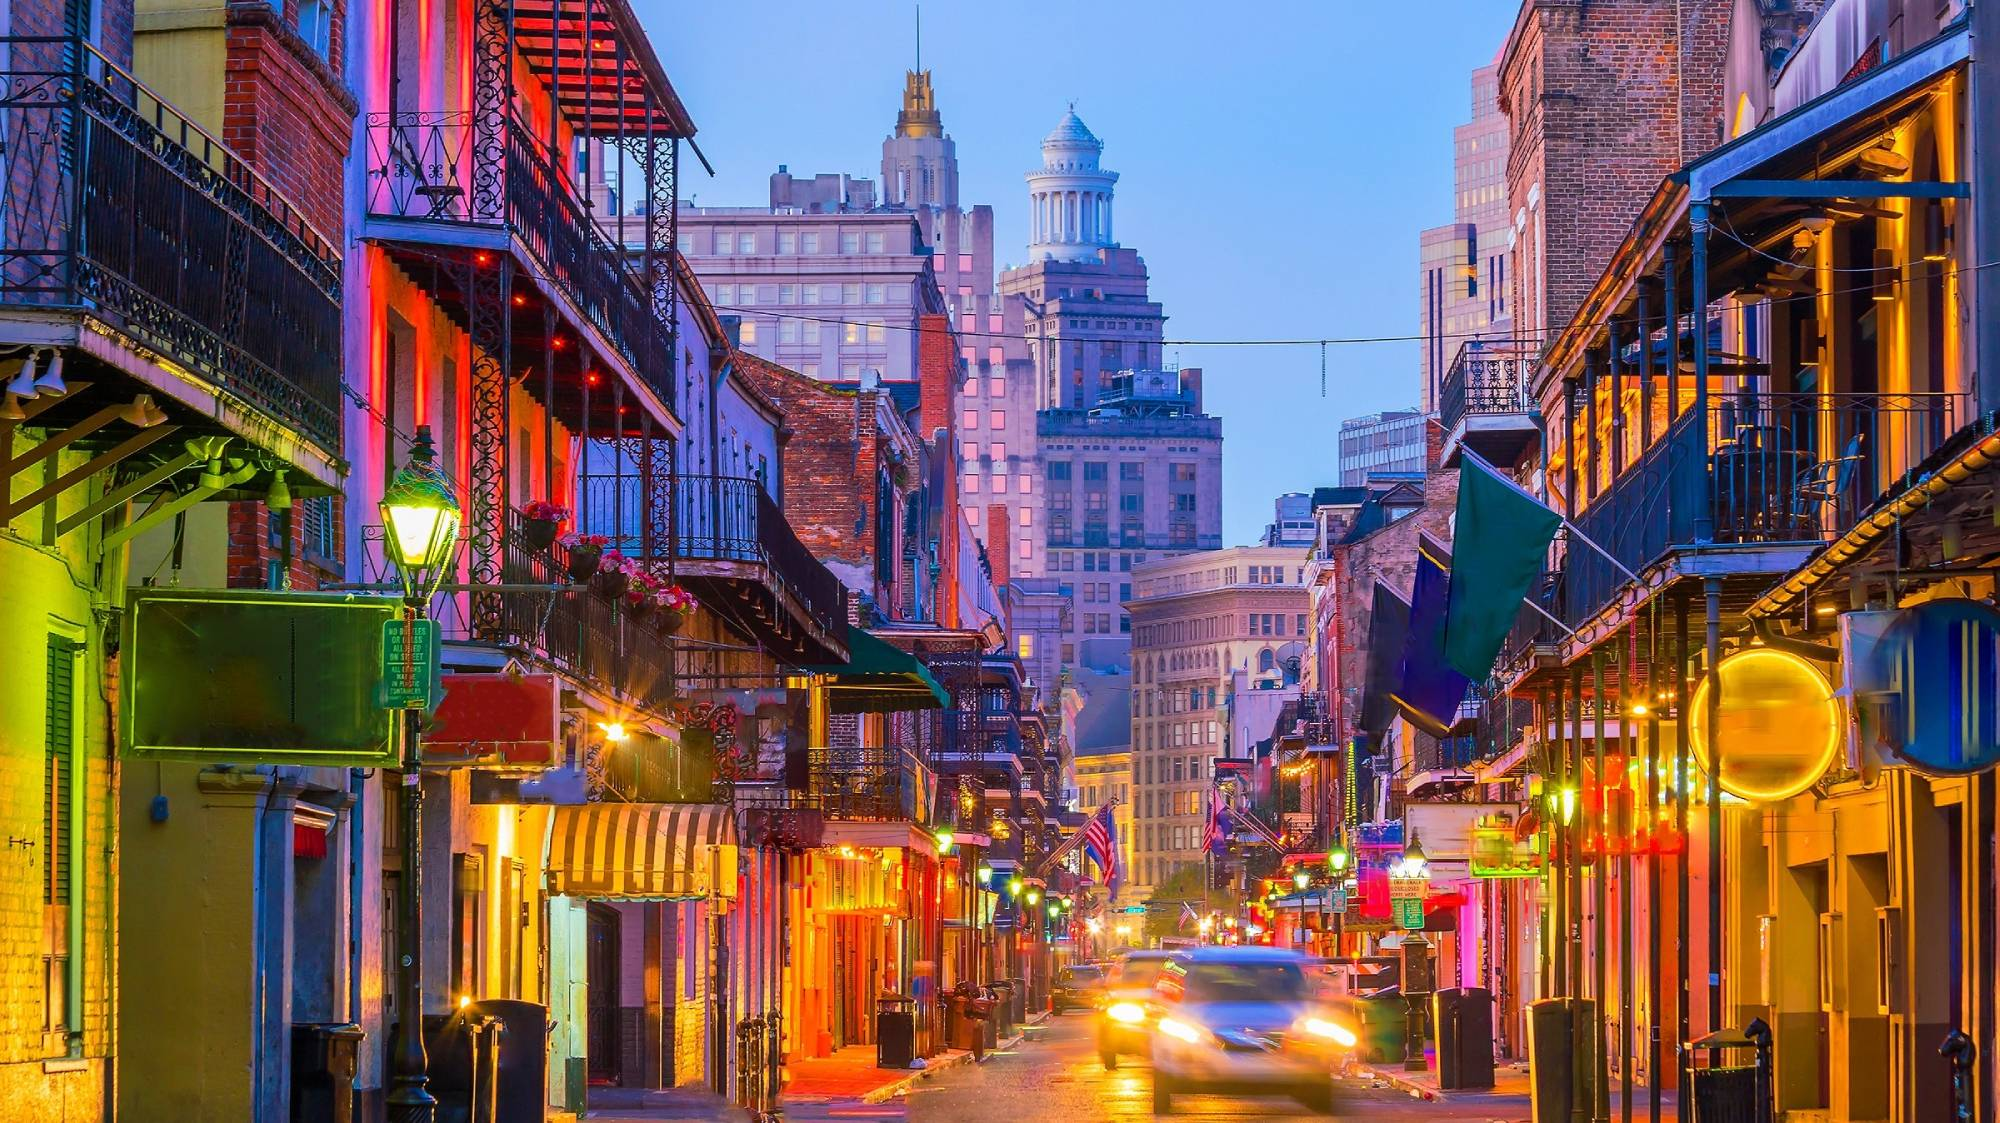 New Orleans - Travel Blog